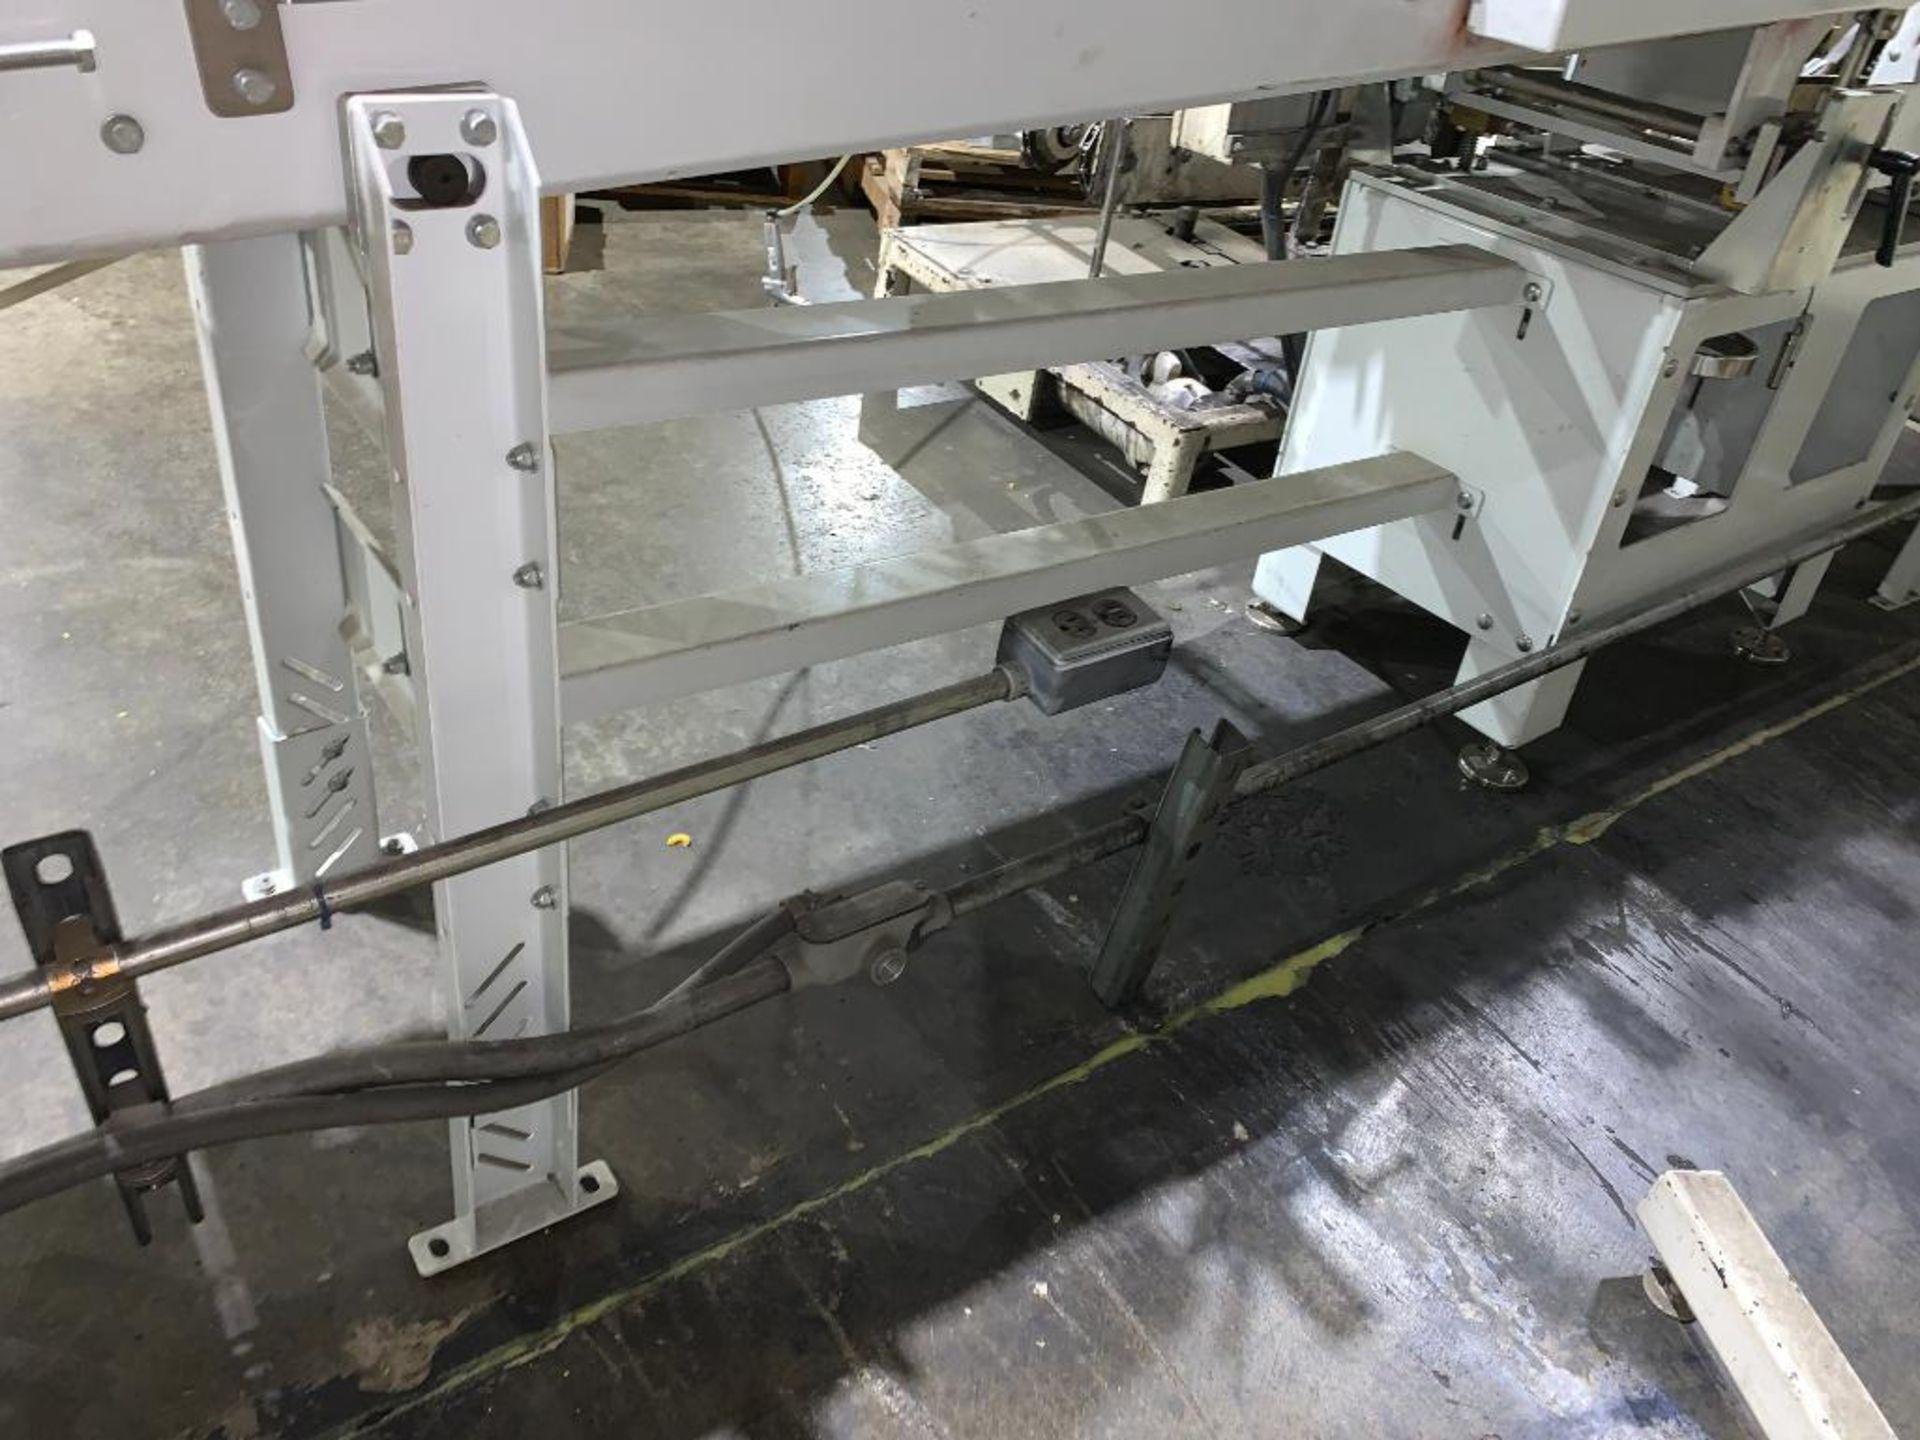 mild steel belt conveyor, 68 in. x 10 in., with box conditioner - Image 6 of 13